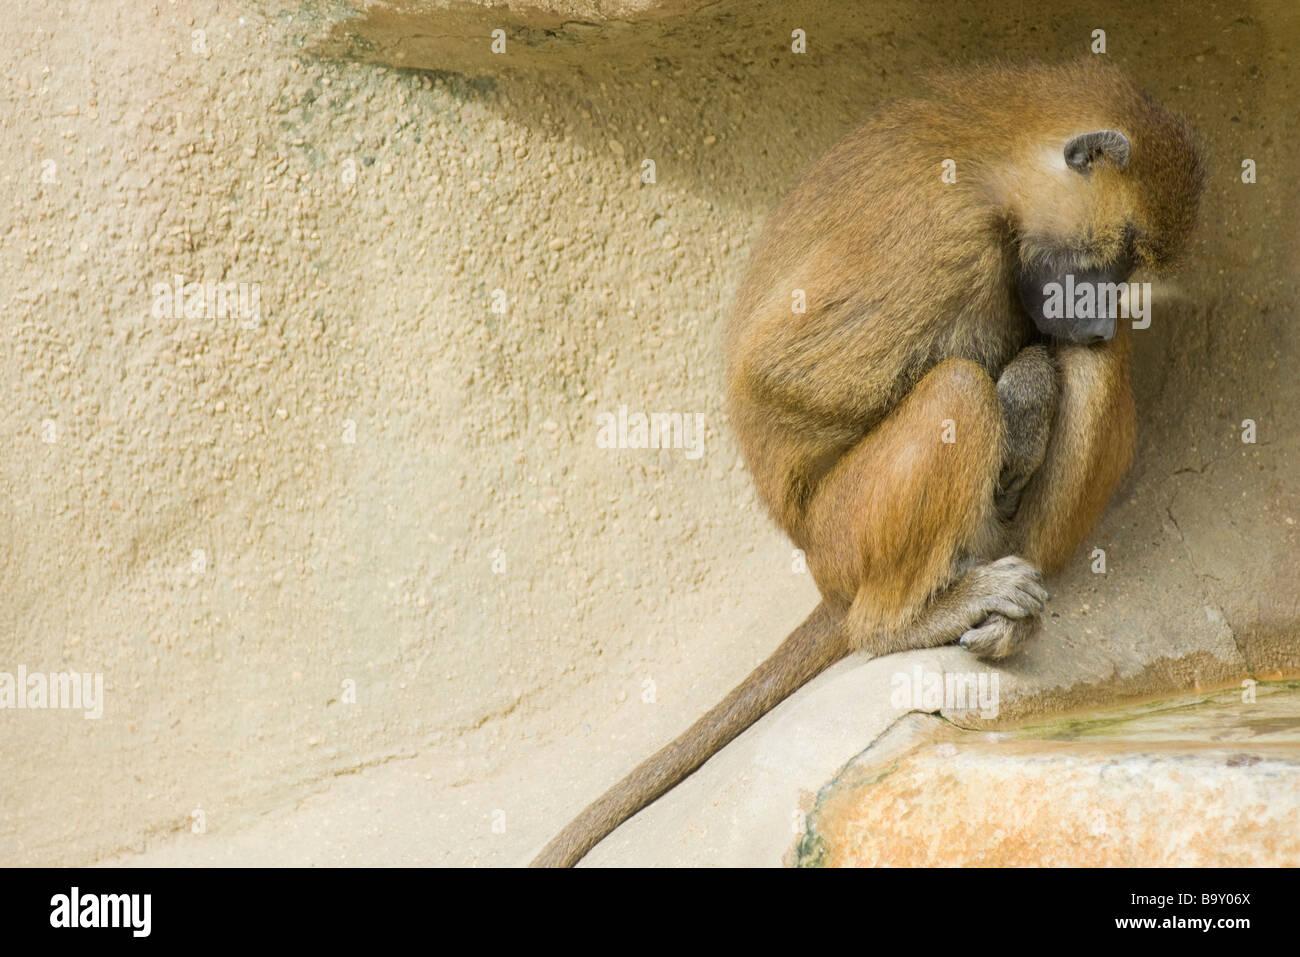 Guinea Baboon (Papio papio) - Stock Image